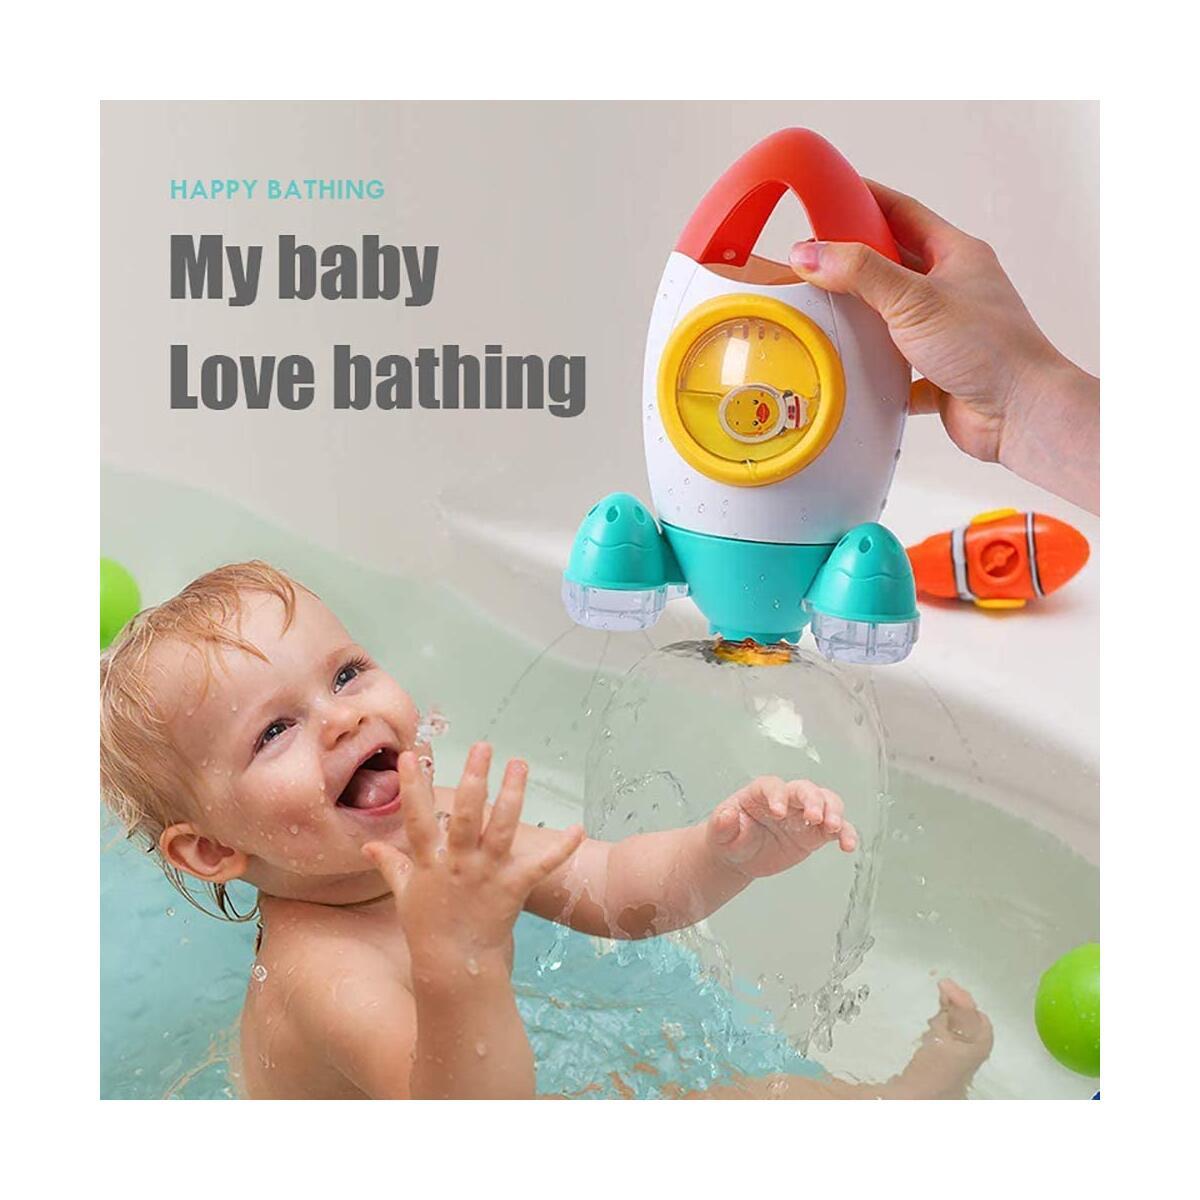 https://www.amazon.com/HANMUN-Rocket-Shower-Toddlers-Children/dp/B089CZ8TWM/ref=sr_1_31?dchild=1&keywords=HANMUN&qid=1597311824&sr=8-31